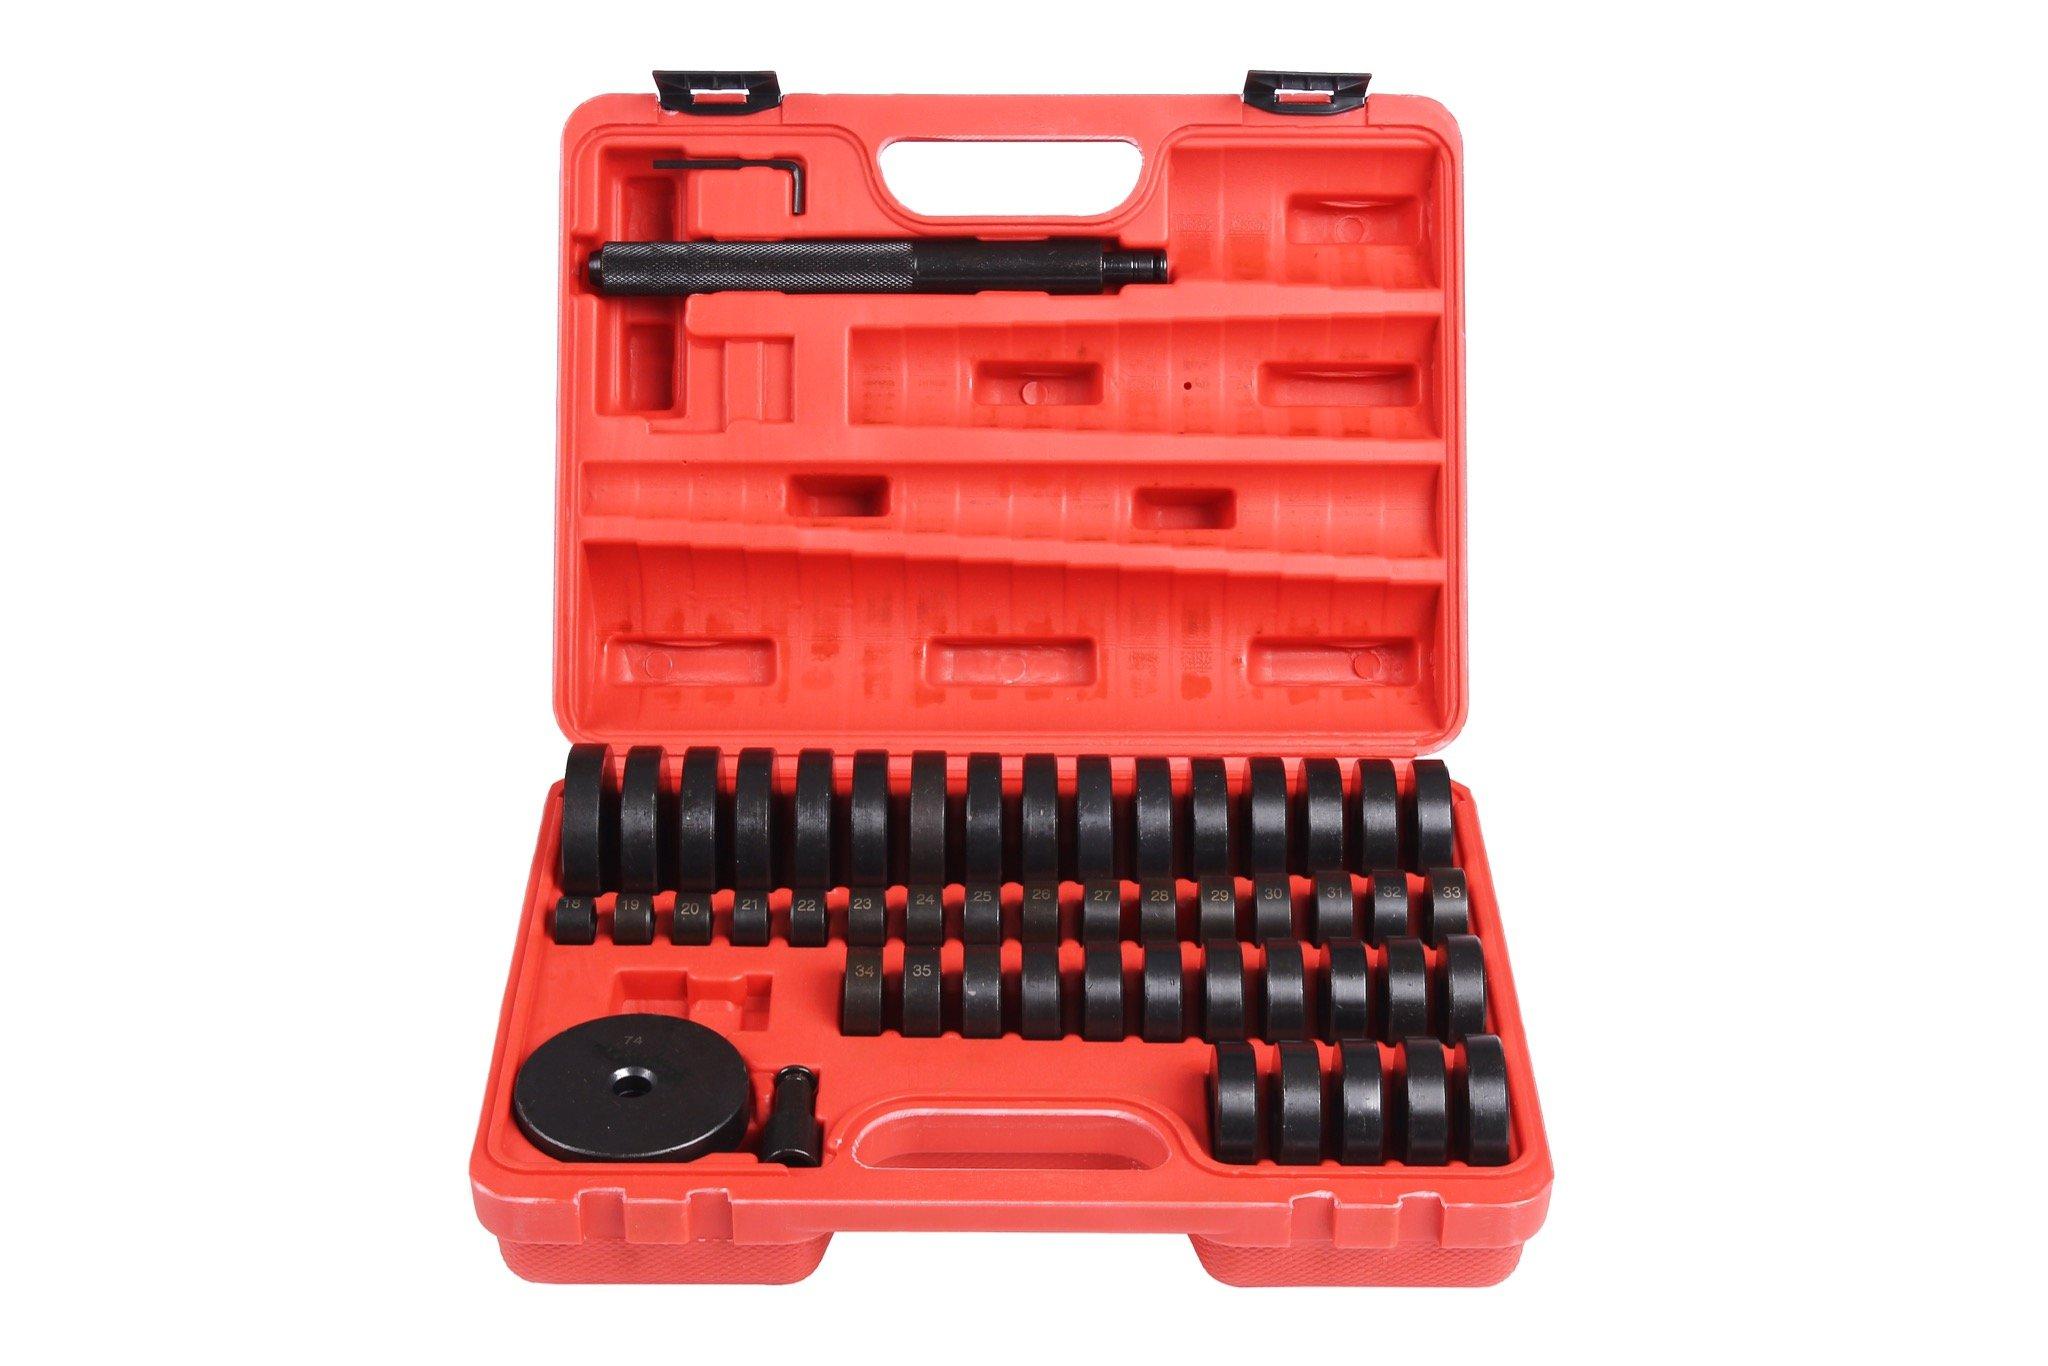 Shankly 50 Piece Seal Drive Set, Bushing Removal Tool, Bushing Driver Set